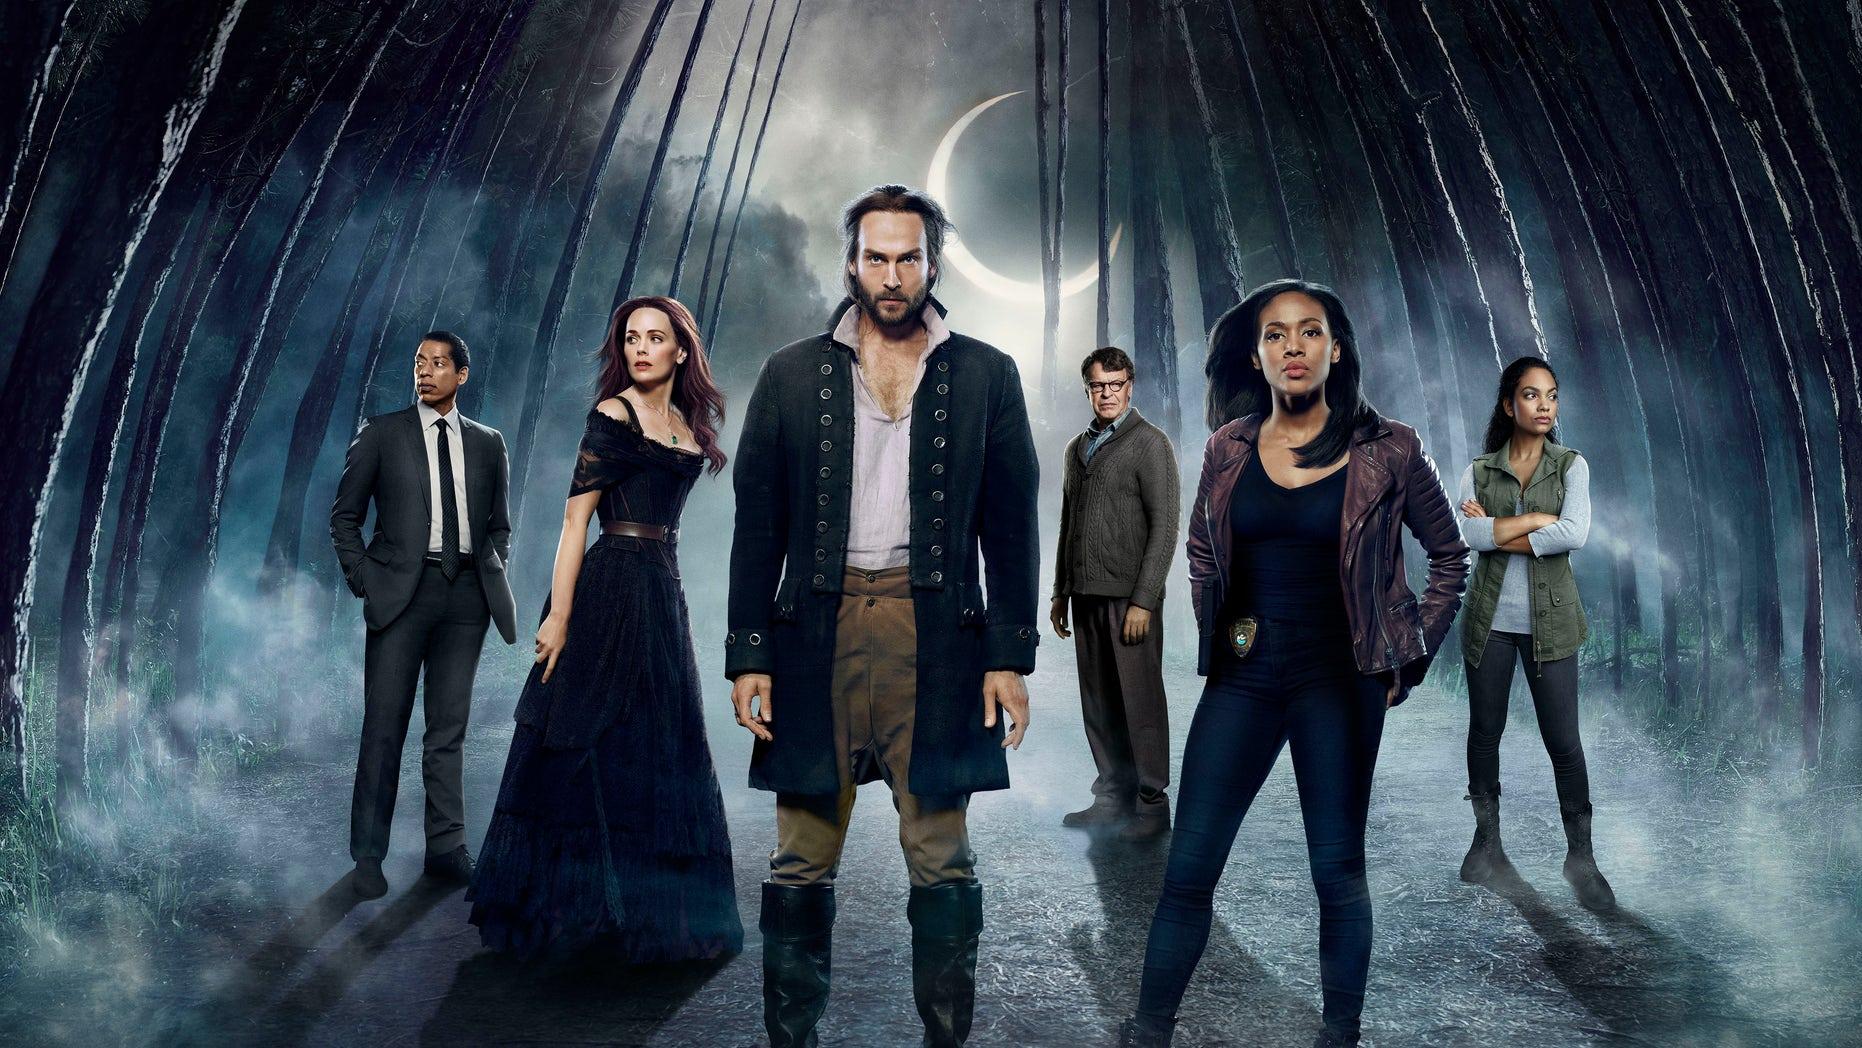 'Sleepy Hollow' cast (L-R): Orlando Jones, Katia Winter, Tom Mison, John Noble, Nicole Beharie and Lyndie Greenwood.